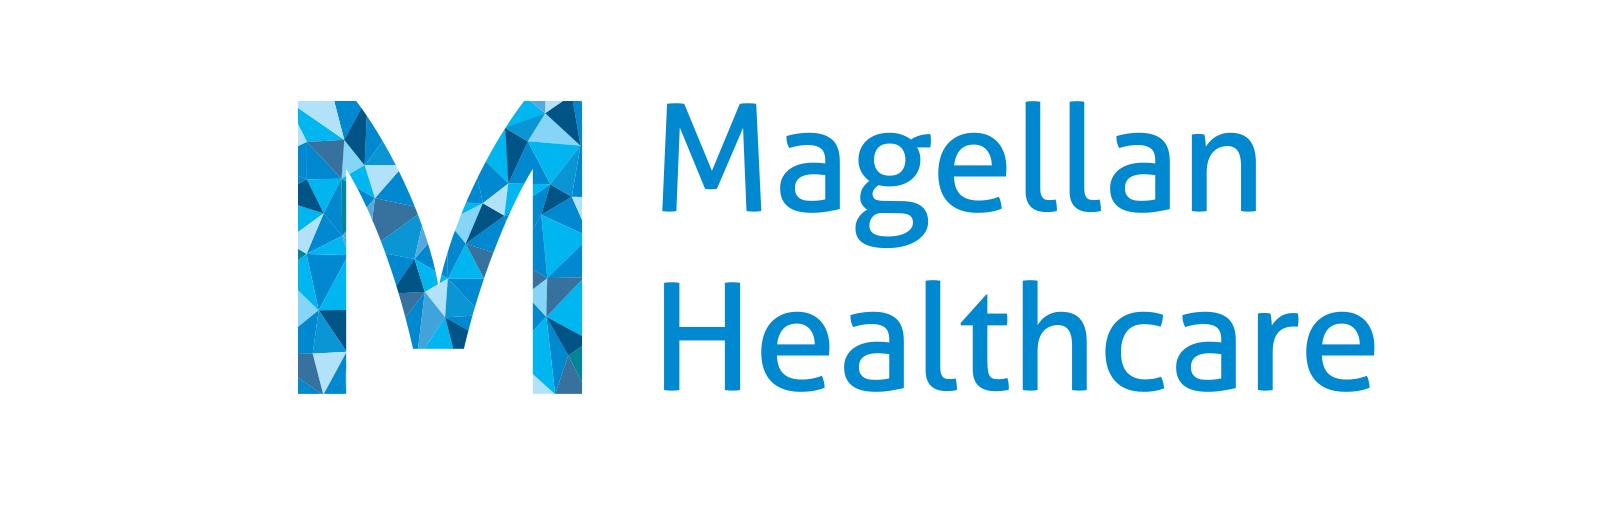 Magellan Healthcare | Magellan Health